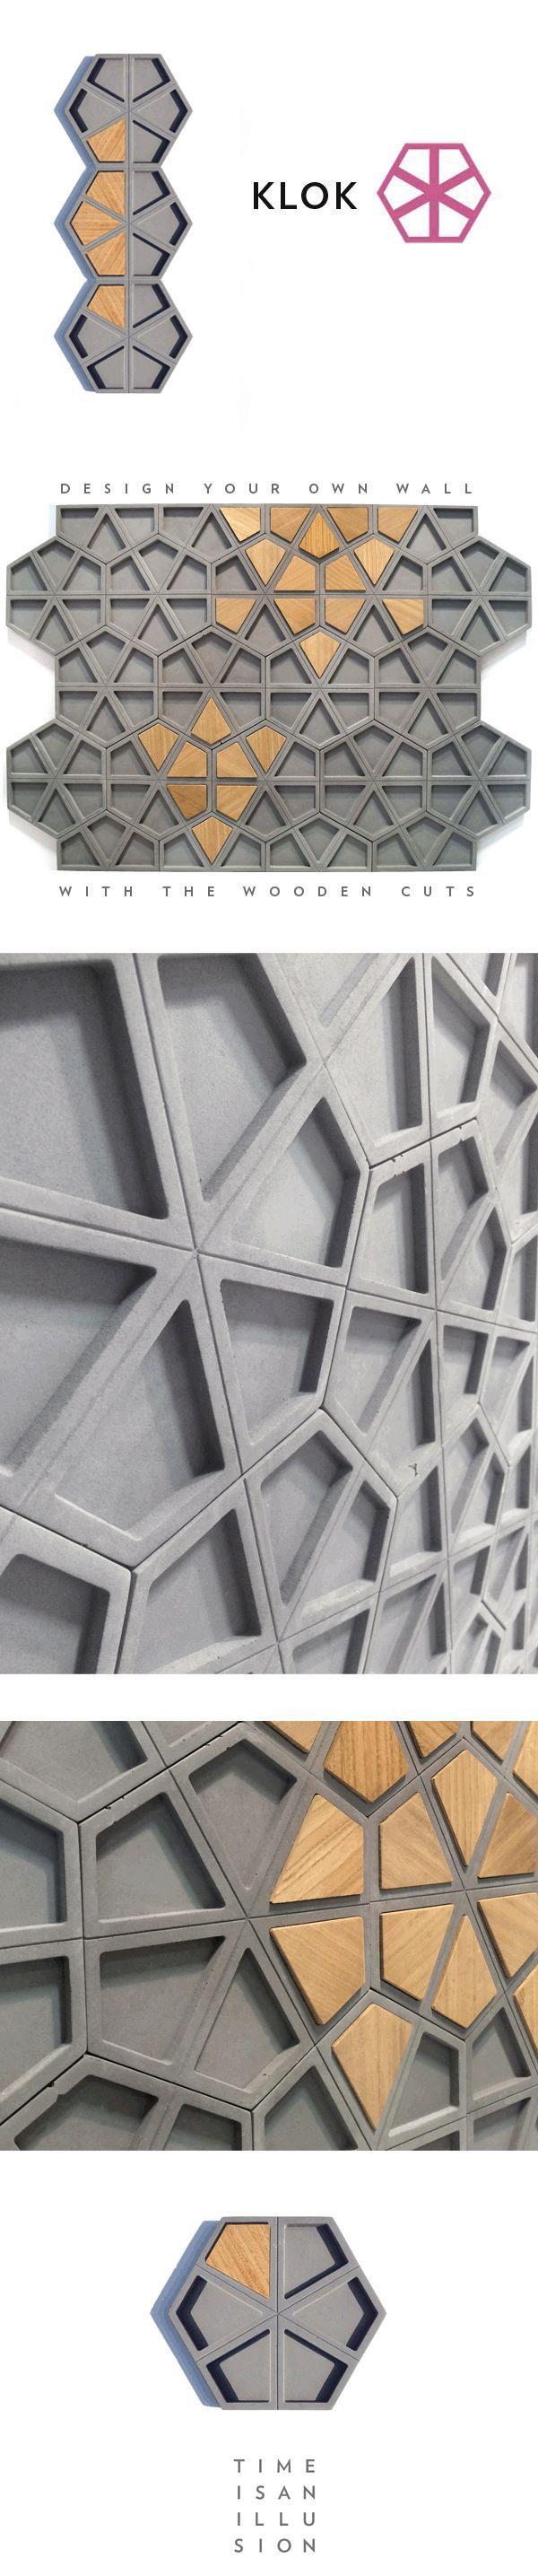 Make Depth In Pattern Deeper For Storage Along Walls